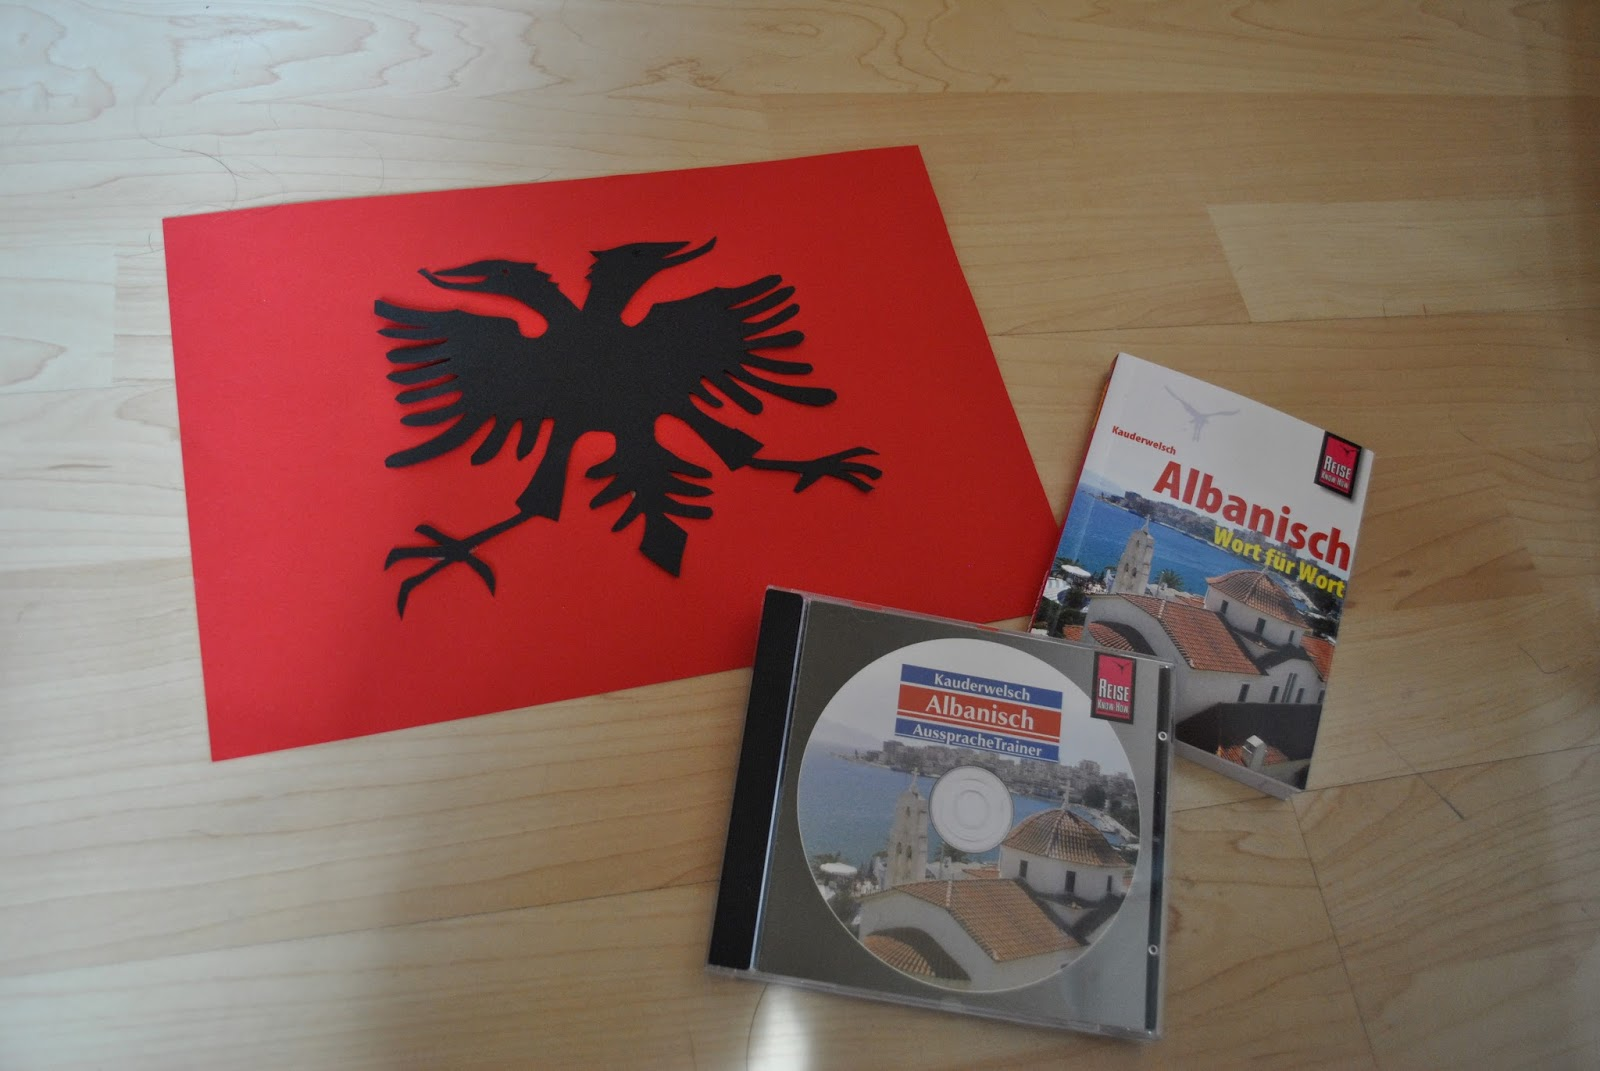 11 Monate Weltwärts In Albanien Qysh Të Lutëm